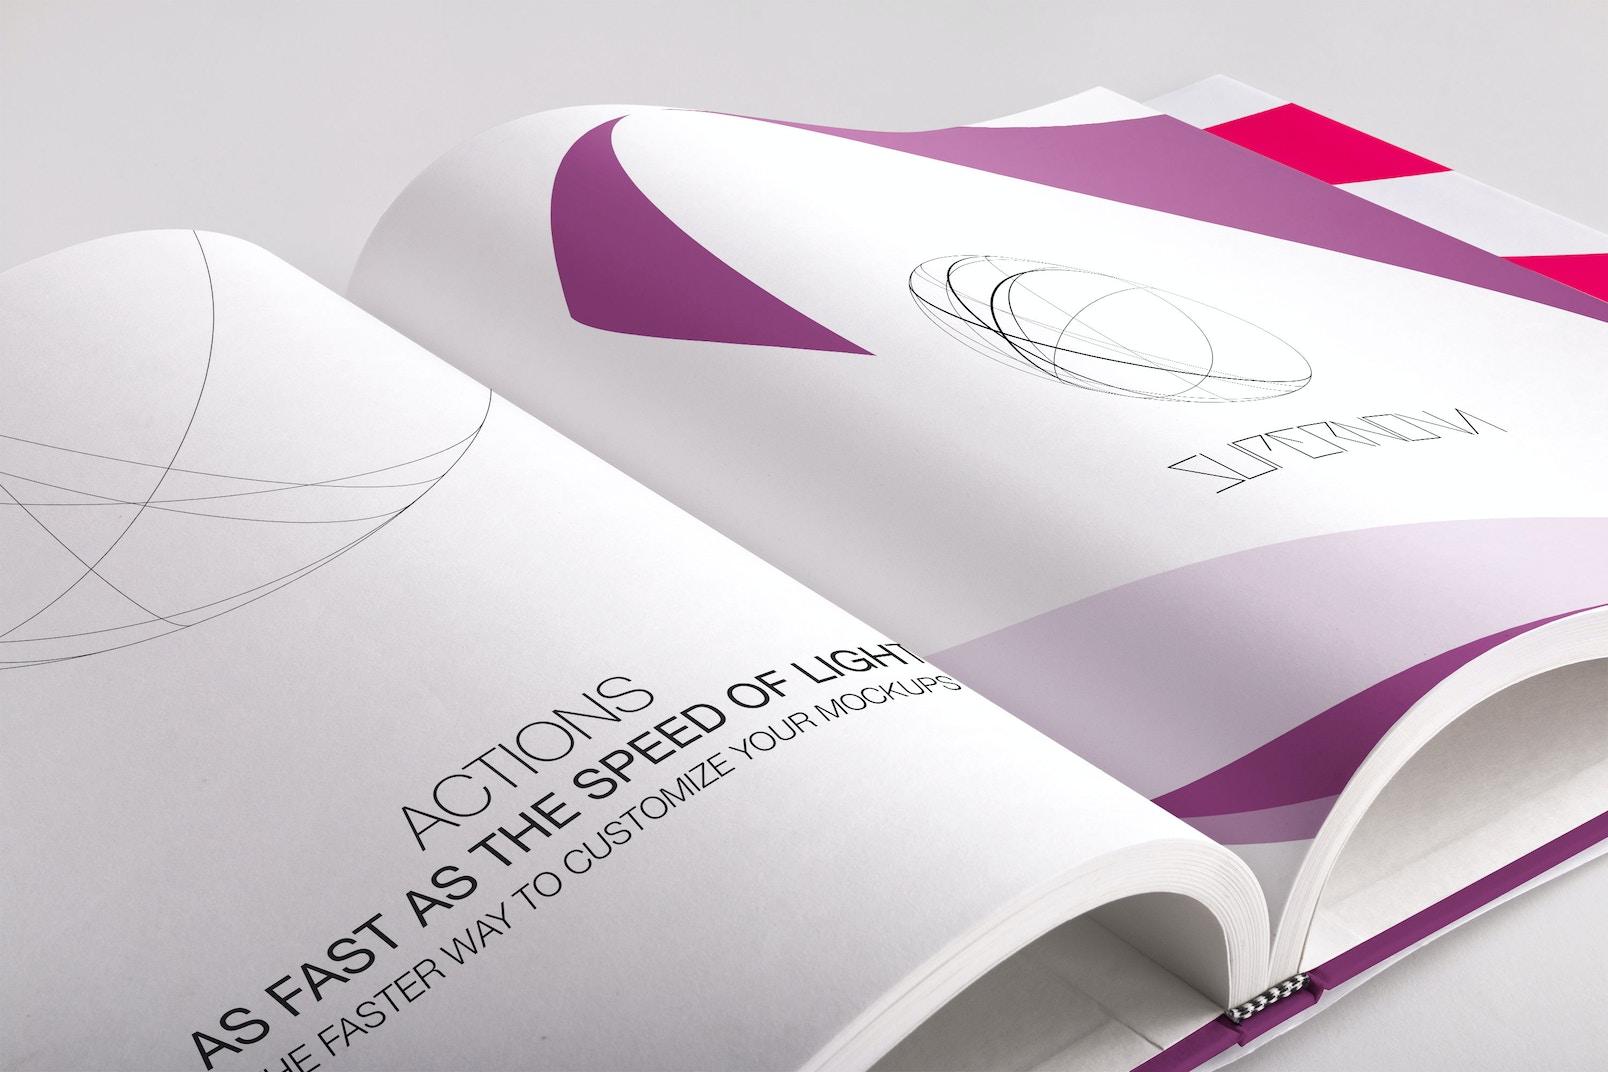 Hardcover Large Square Book PSD Mockup 02